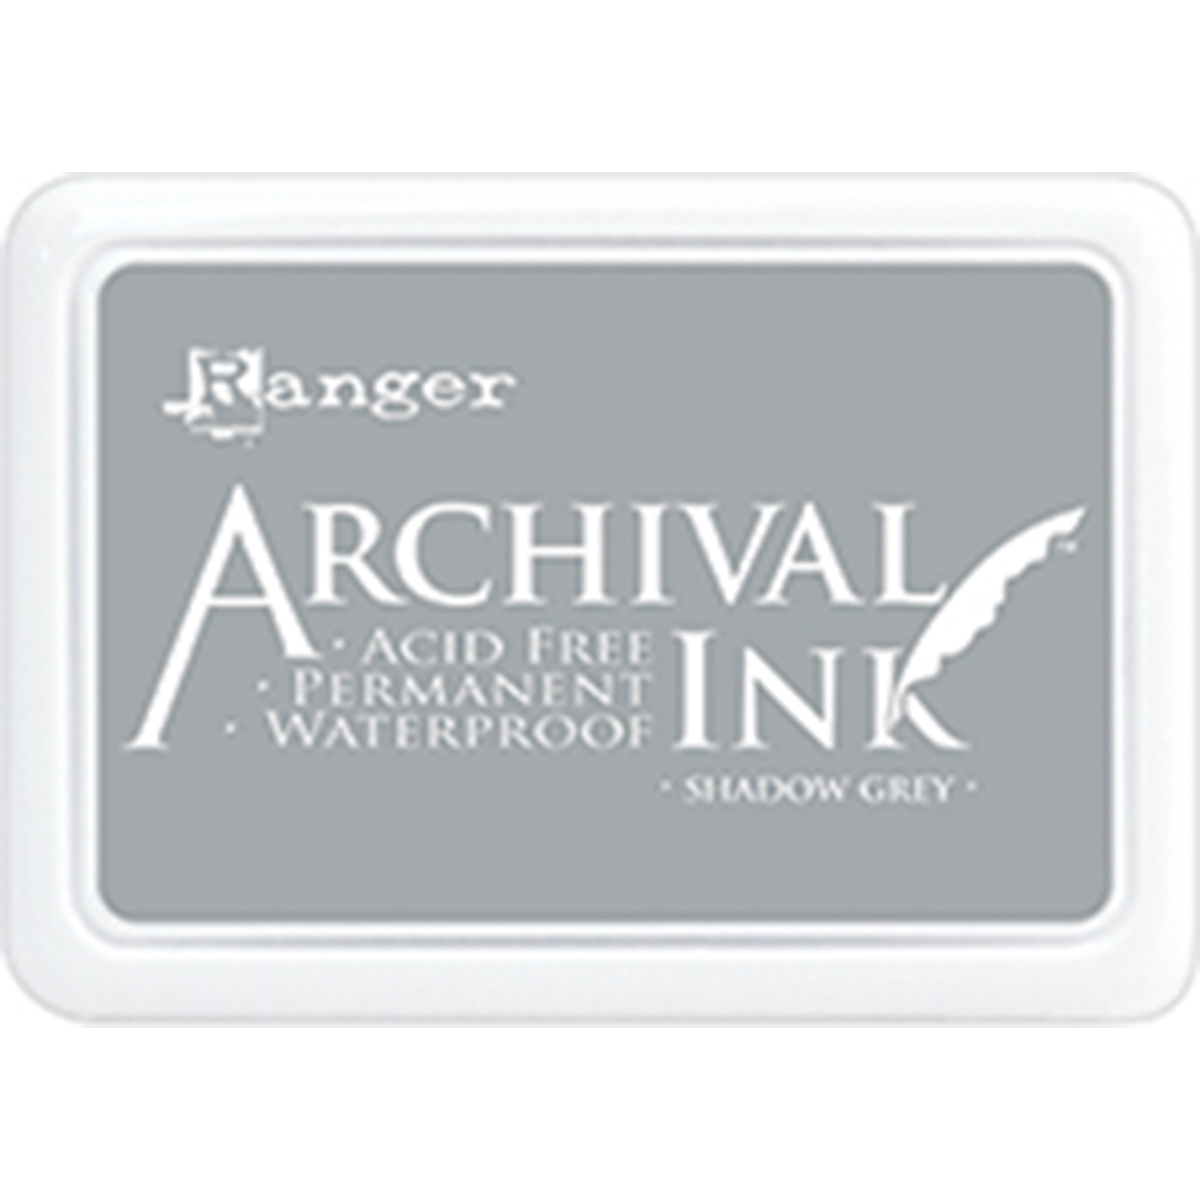 Ranger Archival Ink Pad #0-Shadow Grey